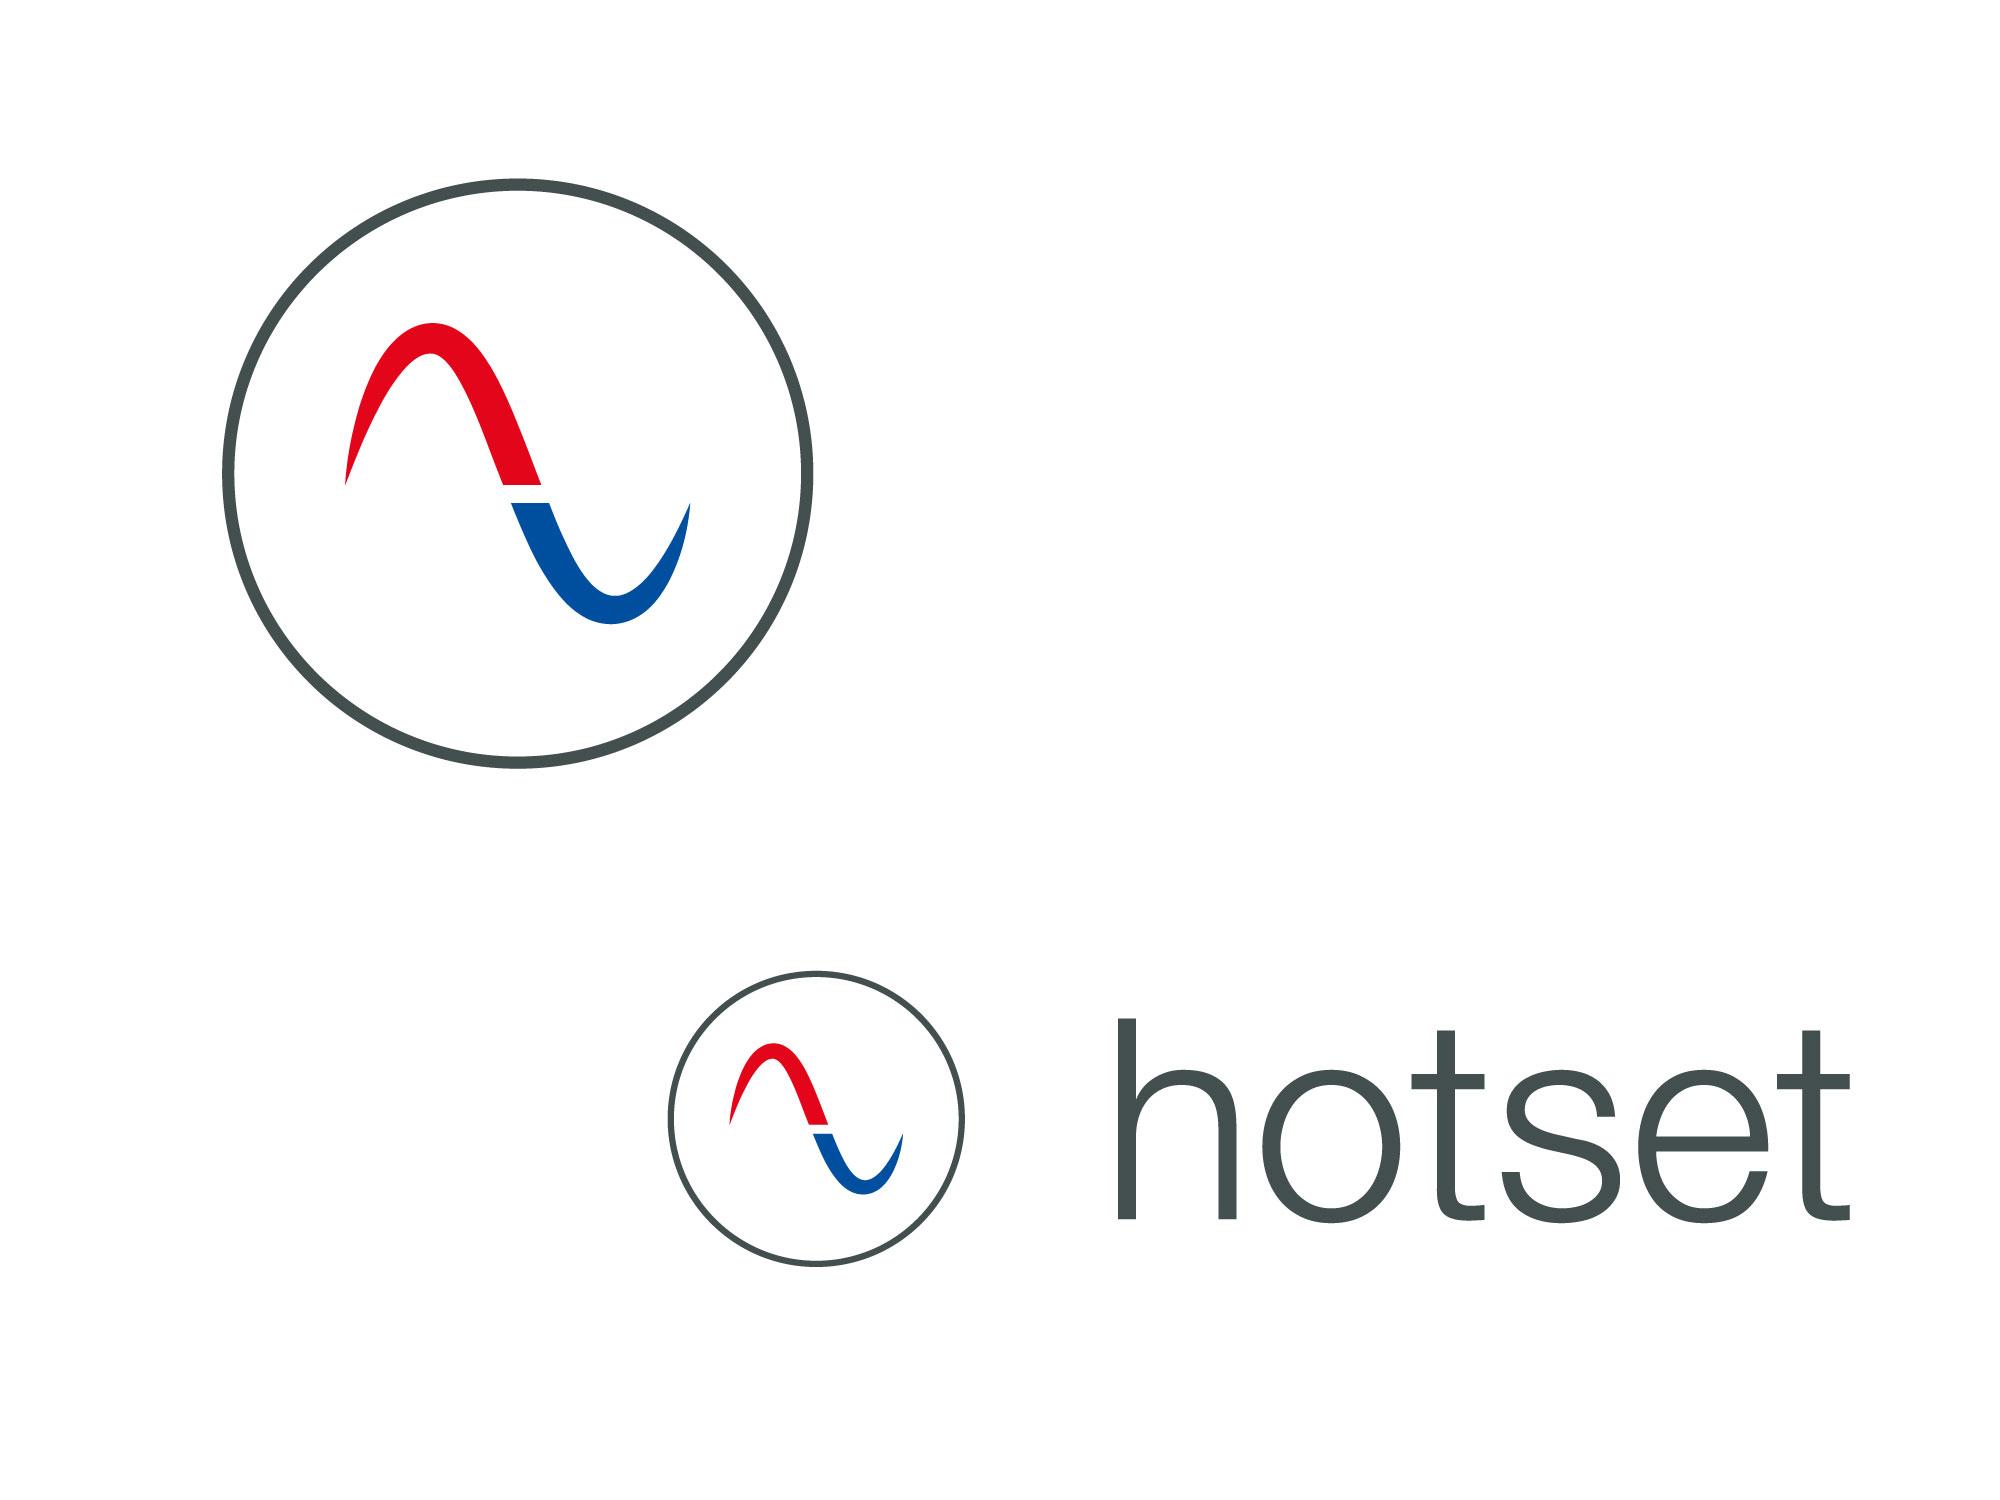 hotset_logos_w